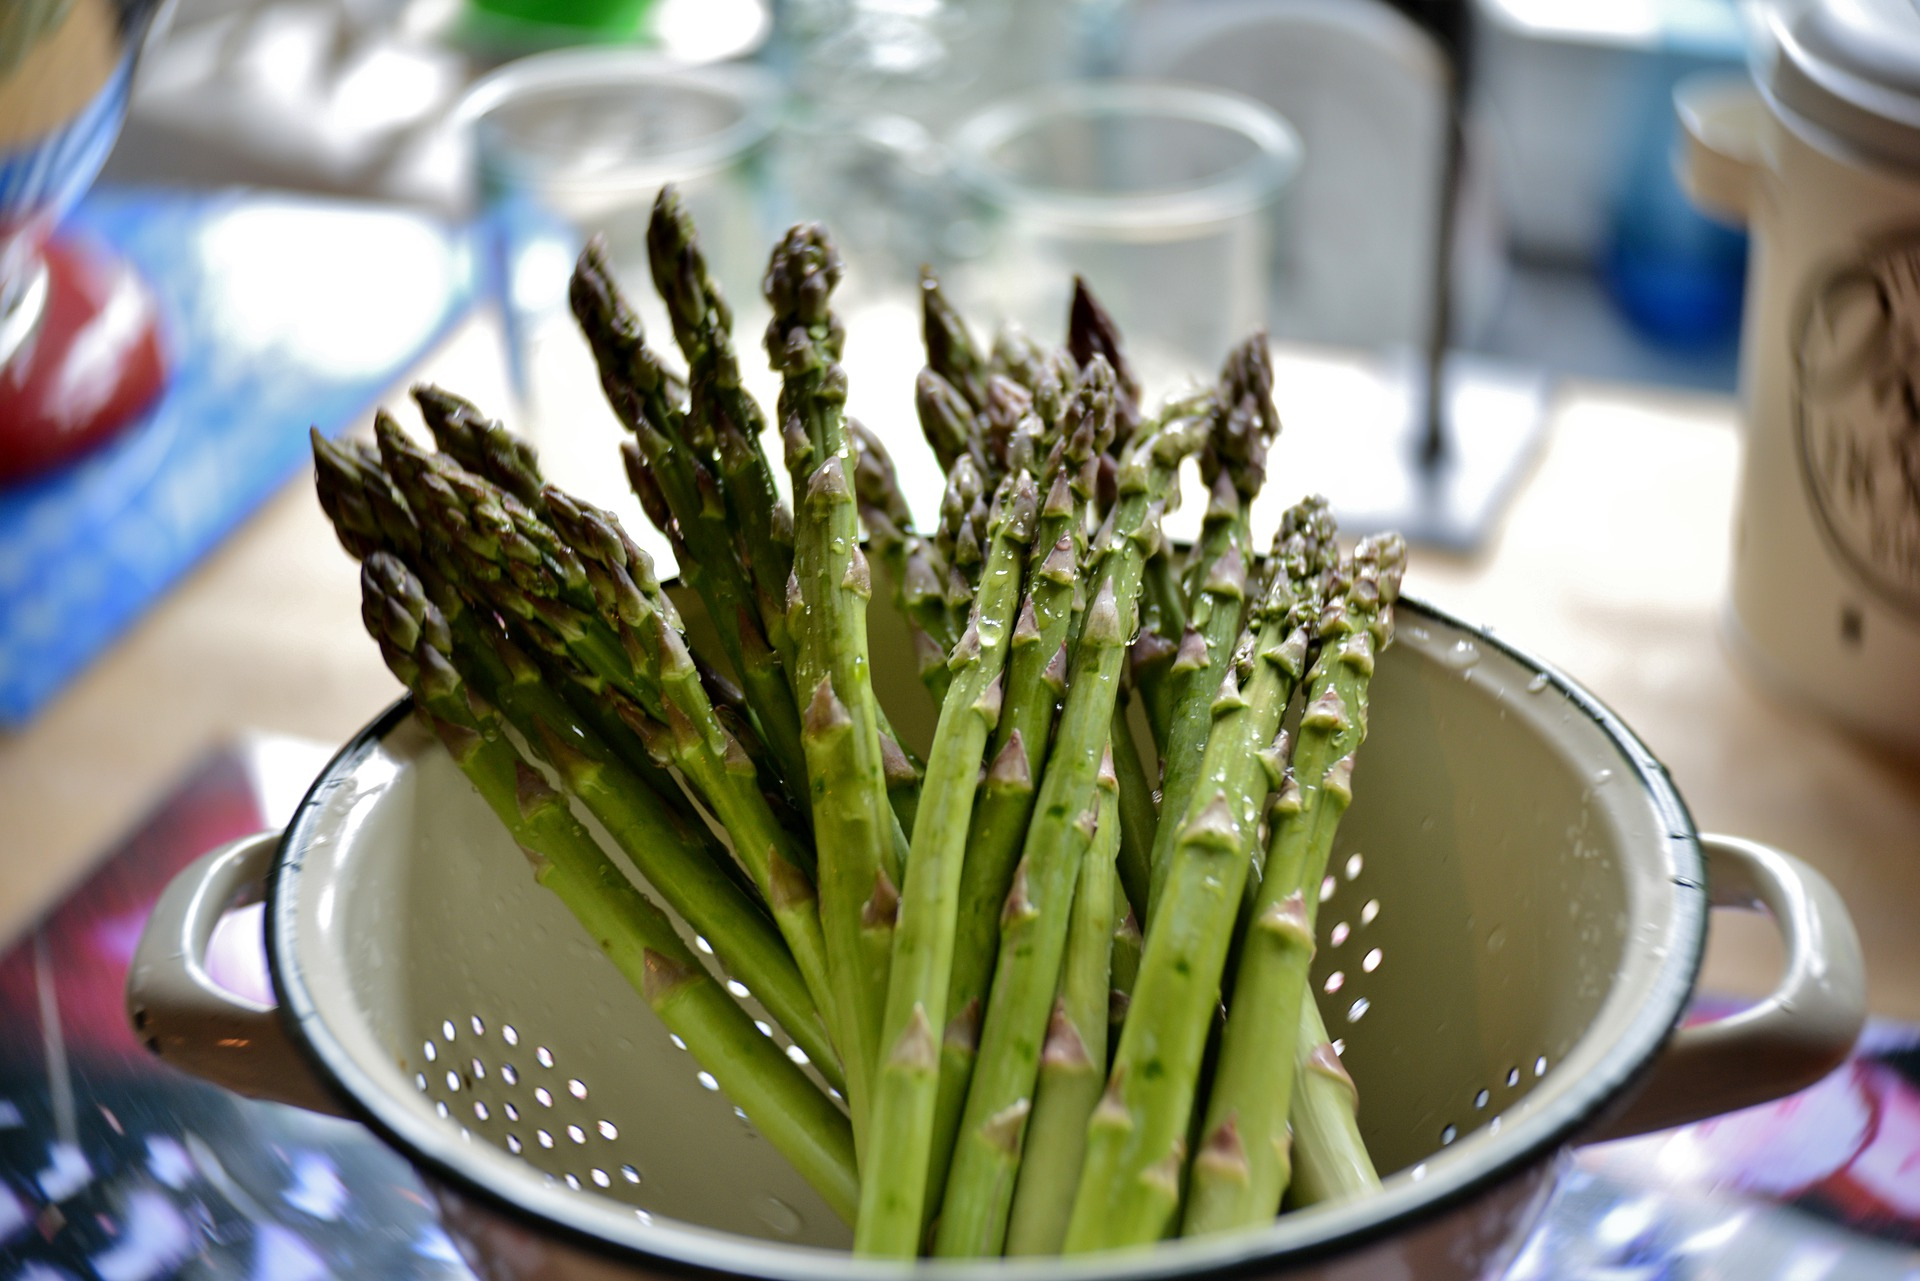 Useful Information on Planting Asparagus